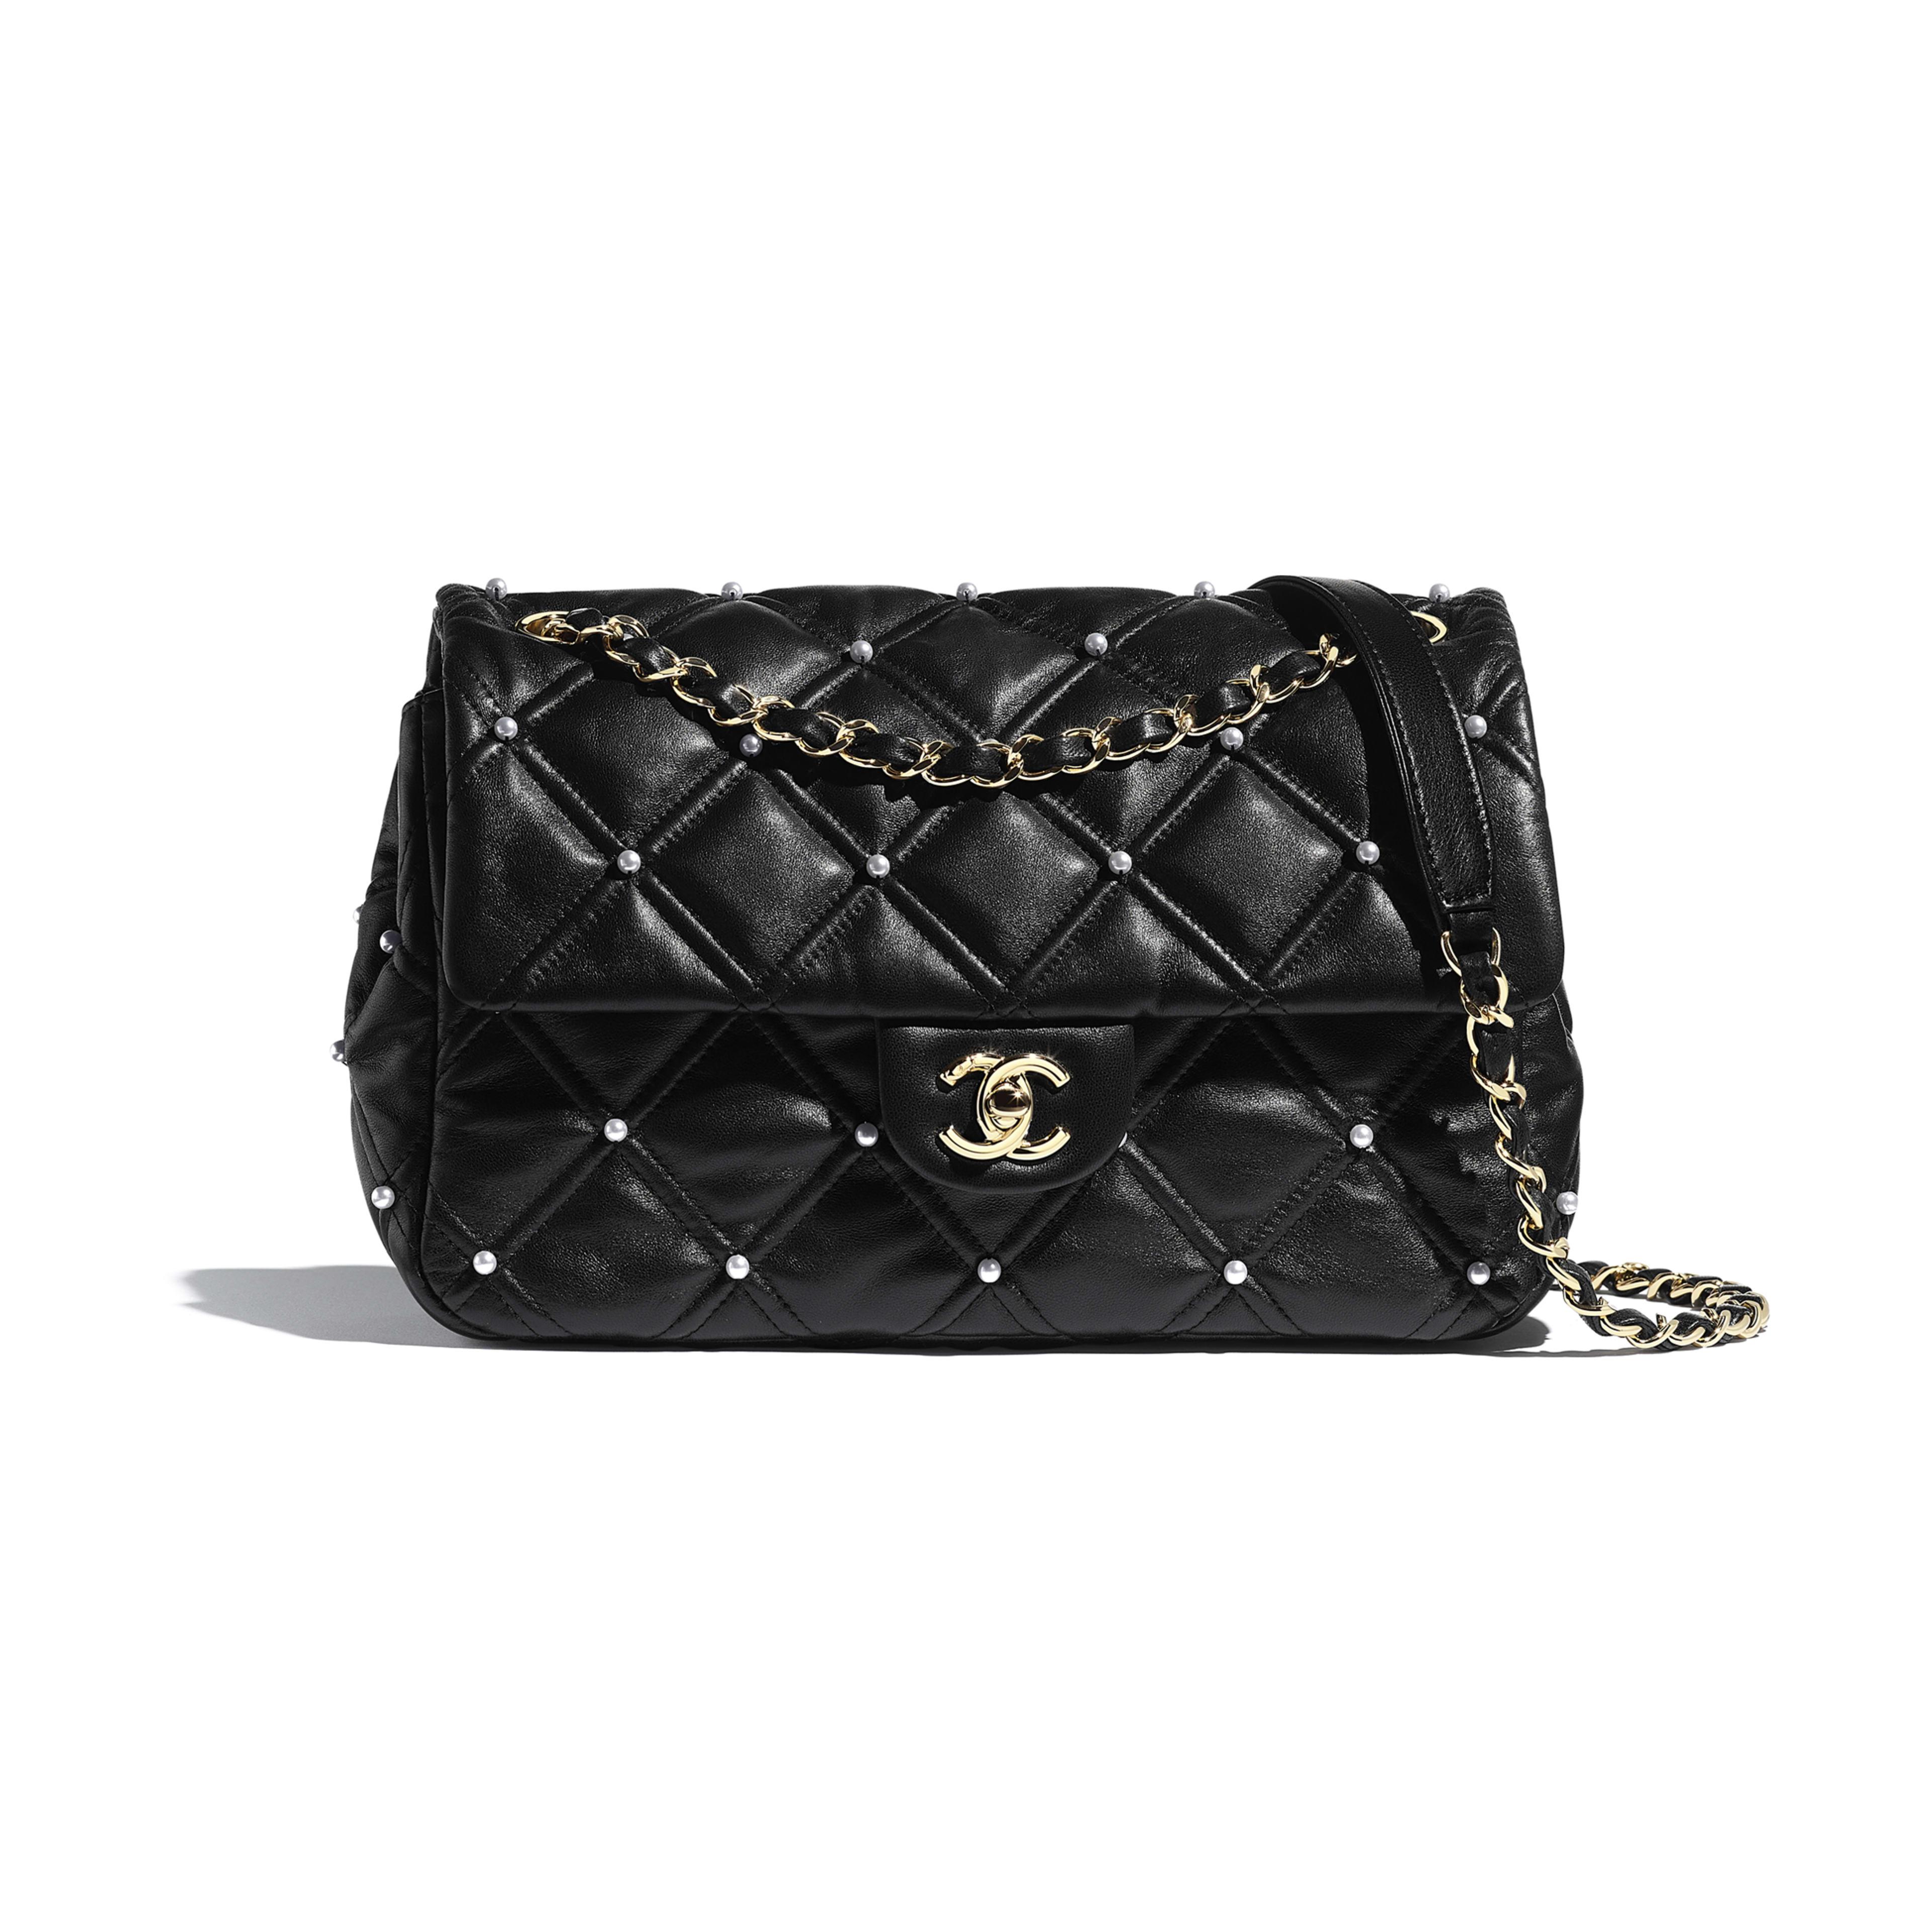 Flap Bag - Black - Lambskin, Imitation Pearls & Gold-Tone Metal - Default view - see full sized version